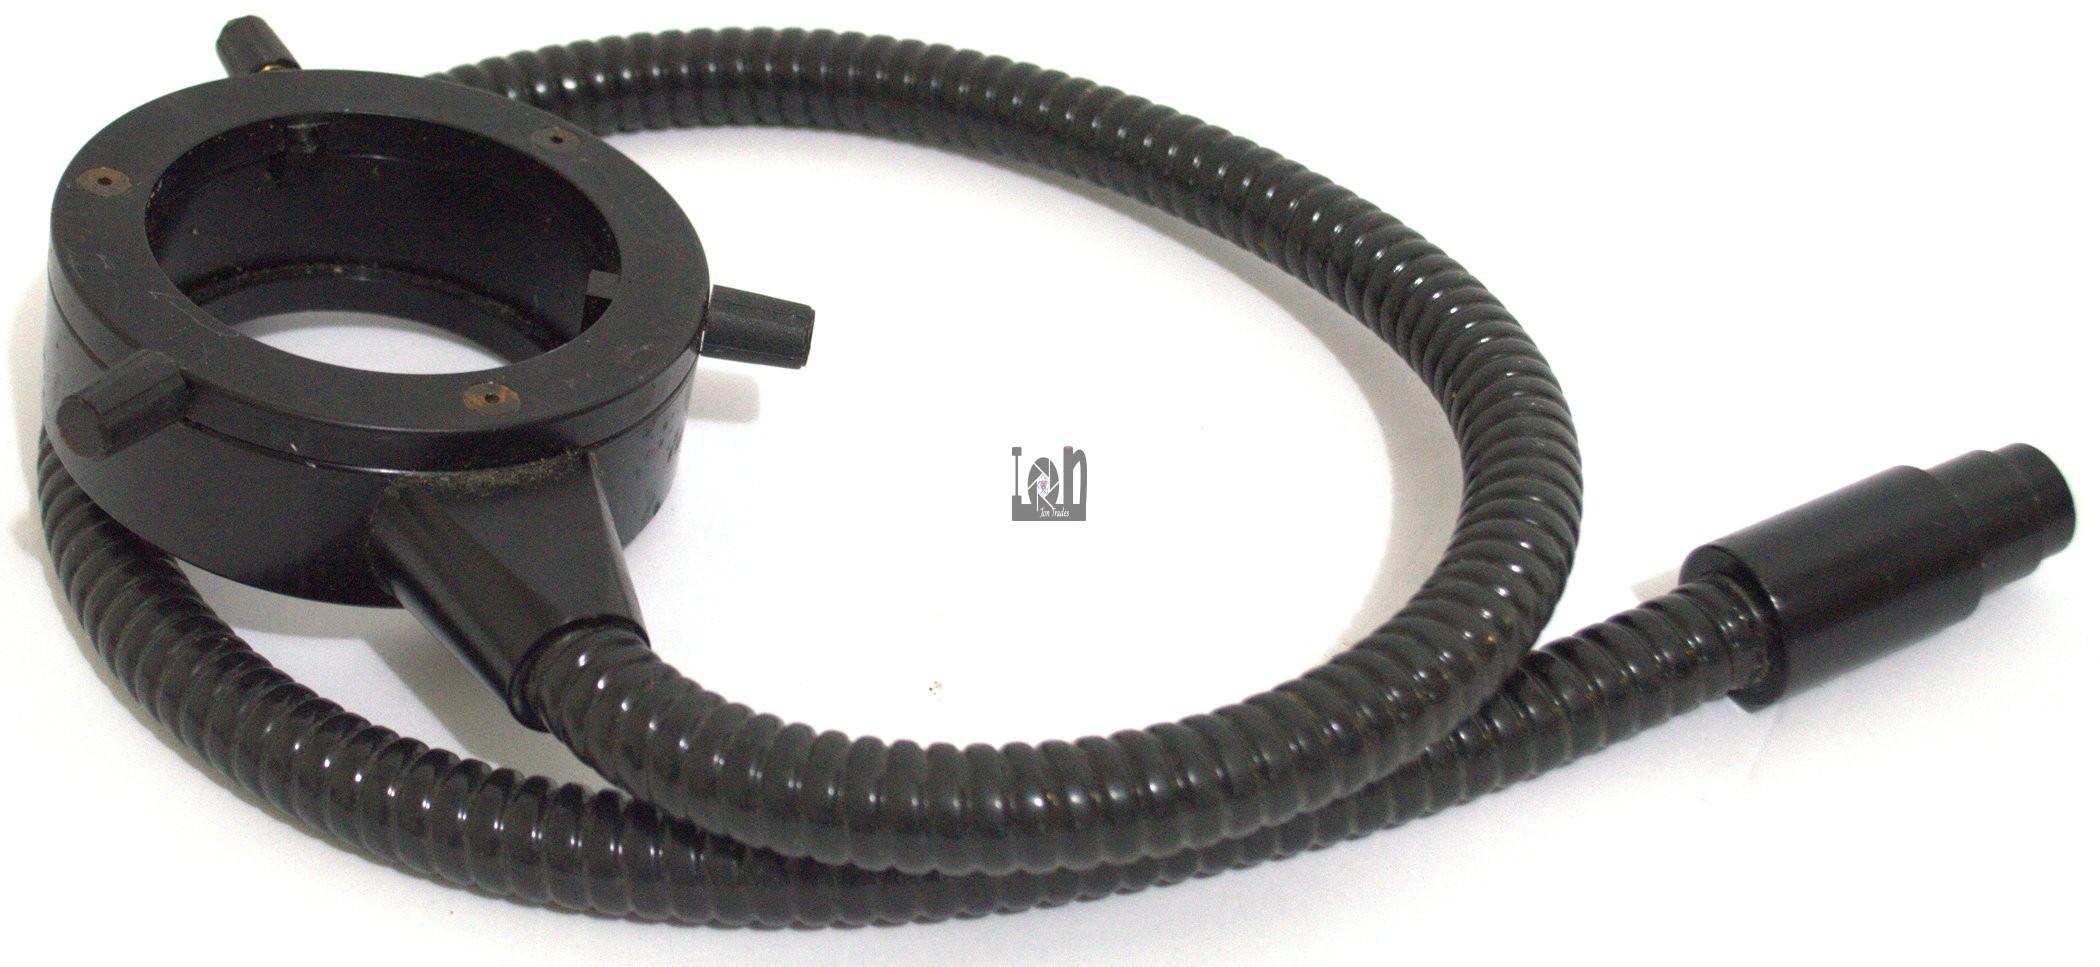 "Fostec Microscope Ring Light 32"" Cord 63mm Diameter 16mm"